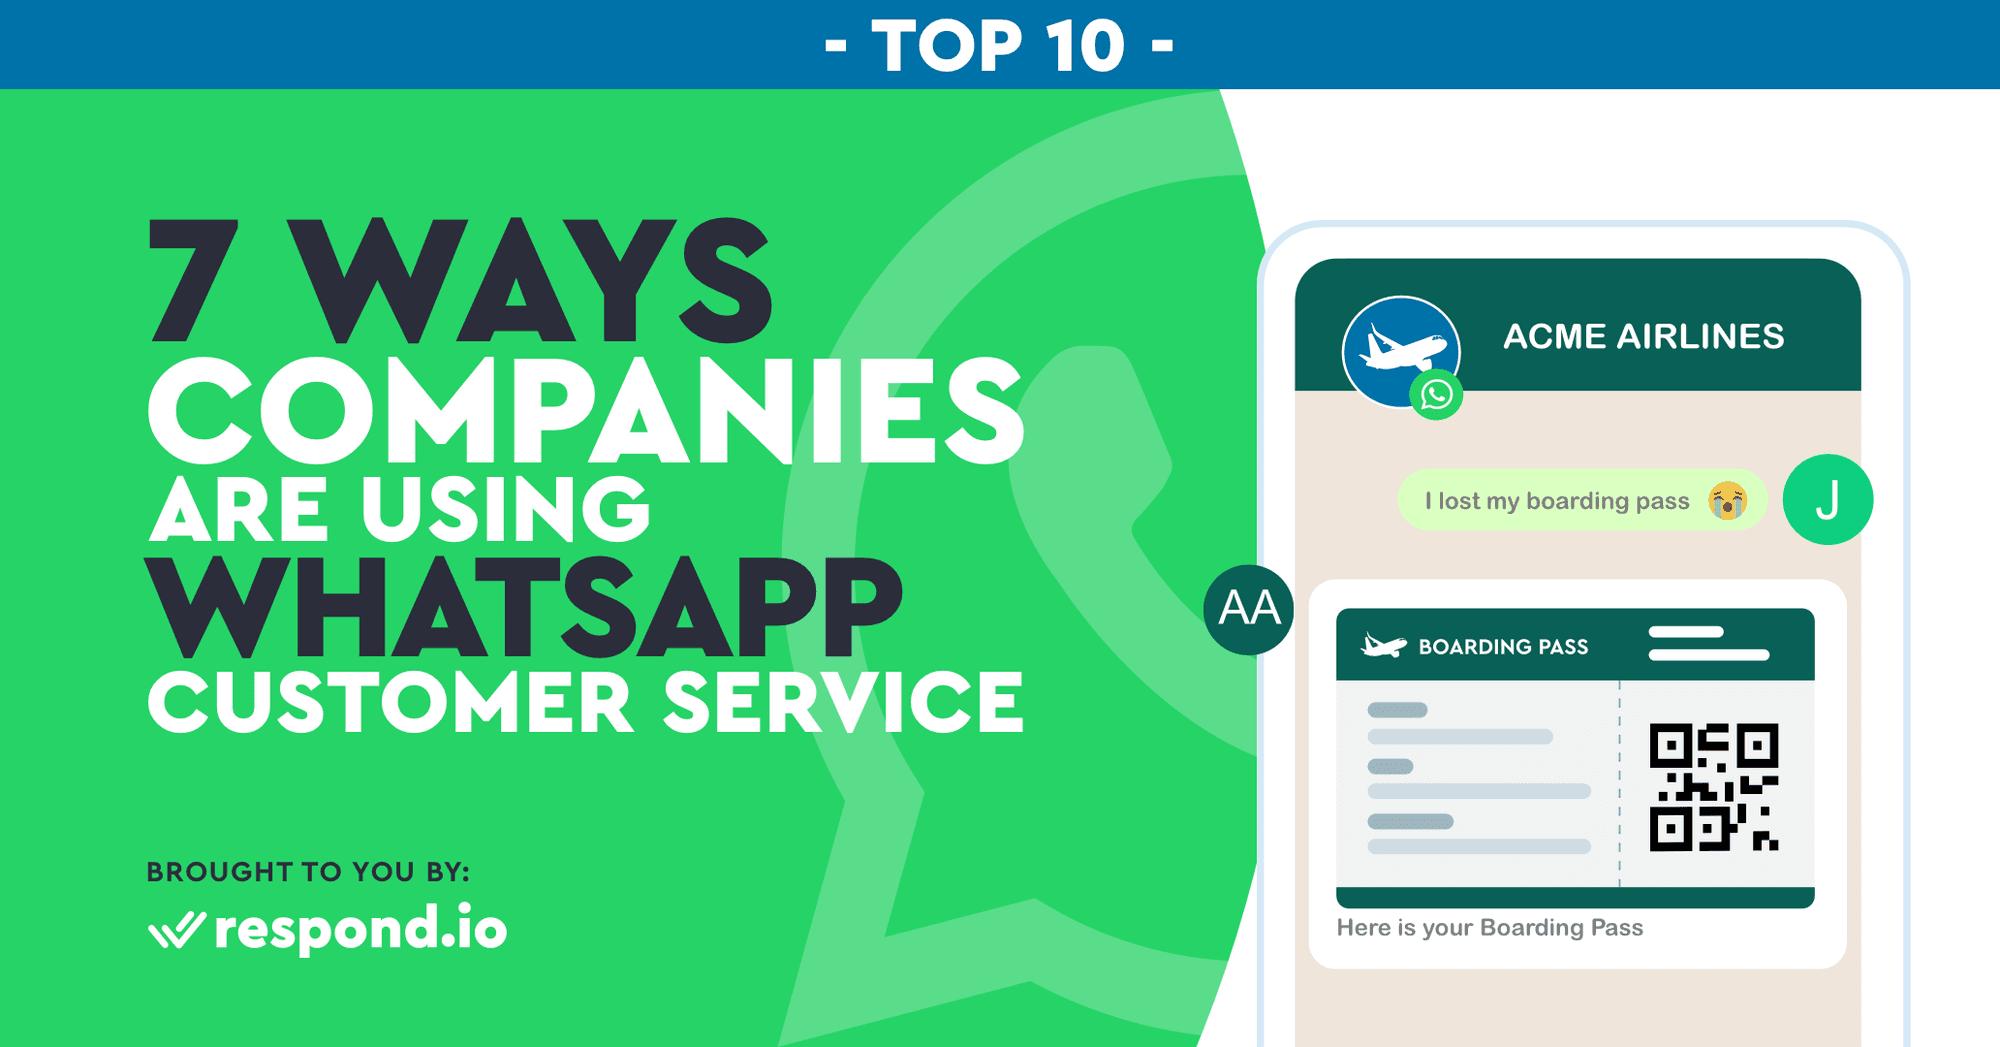 7 Ways Companies Are Using WhatsApp Customer Service